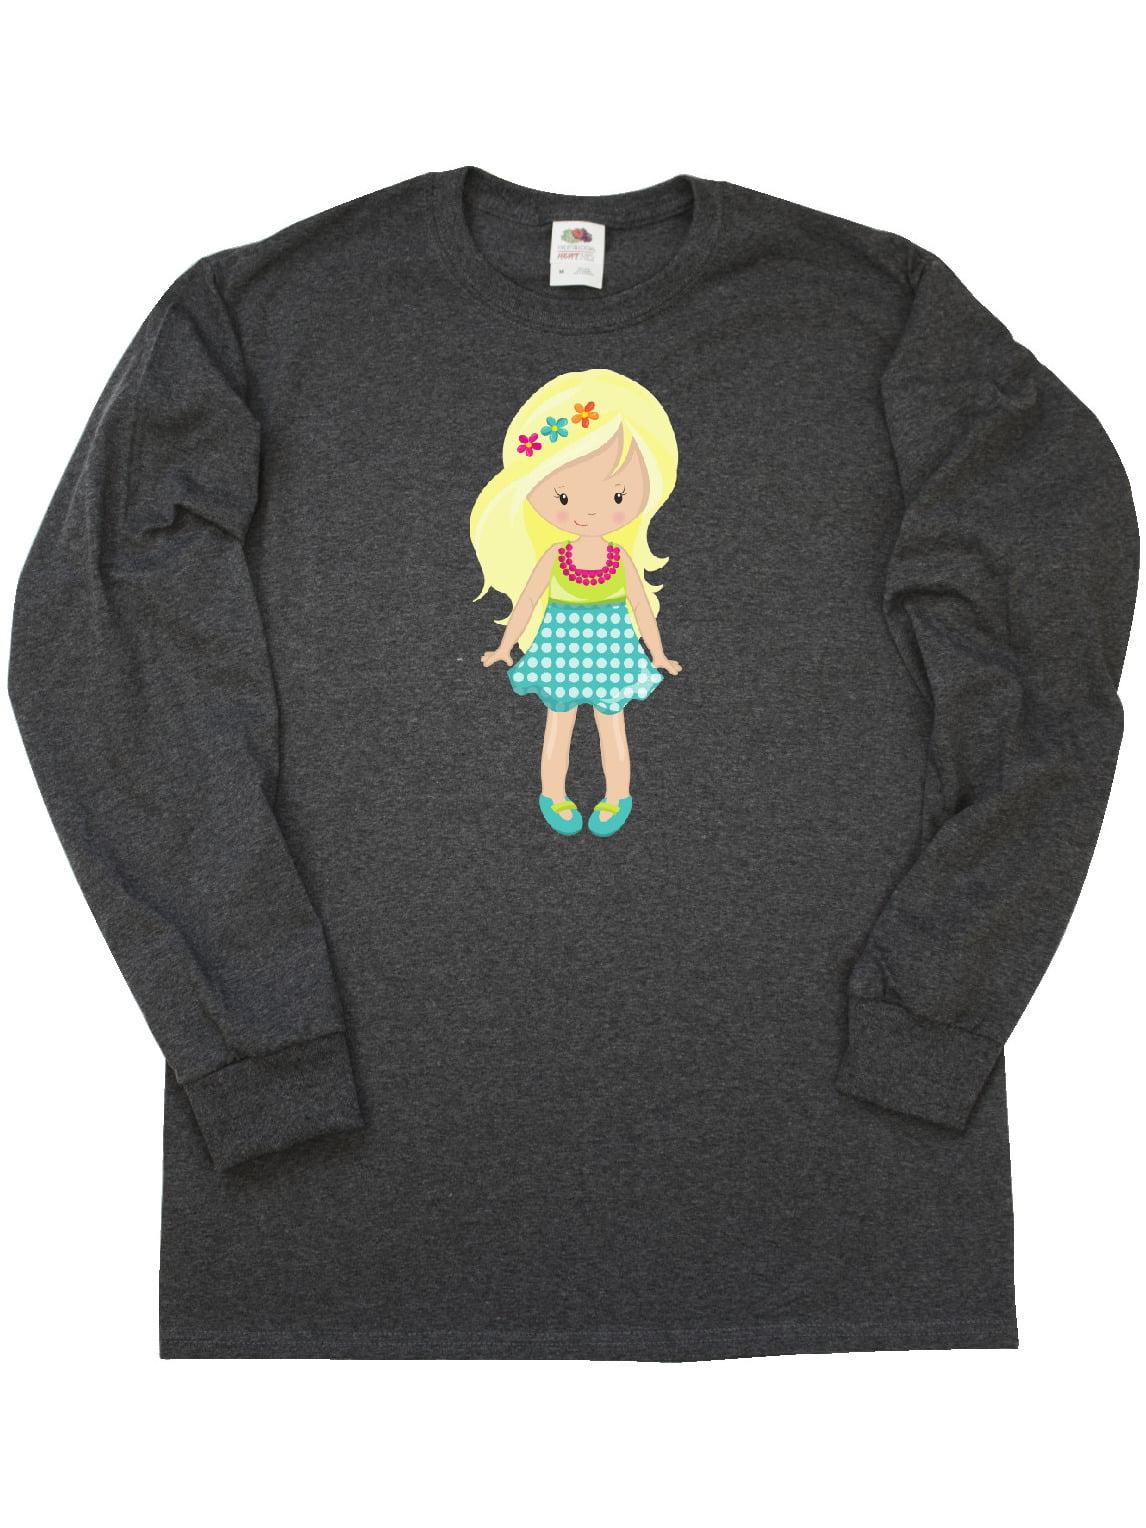 Fashion Girl Blue Jacket Baby T-Shirt inktastic African American Girl